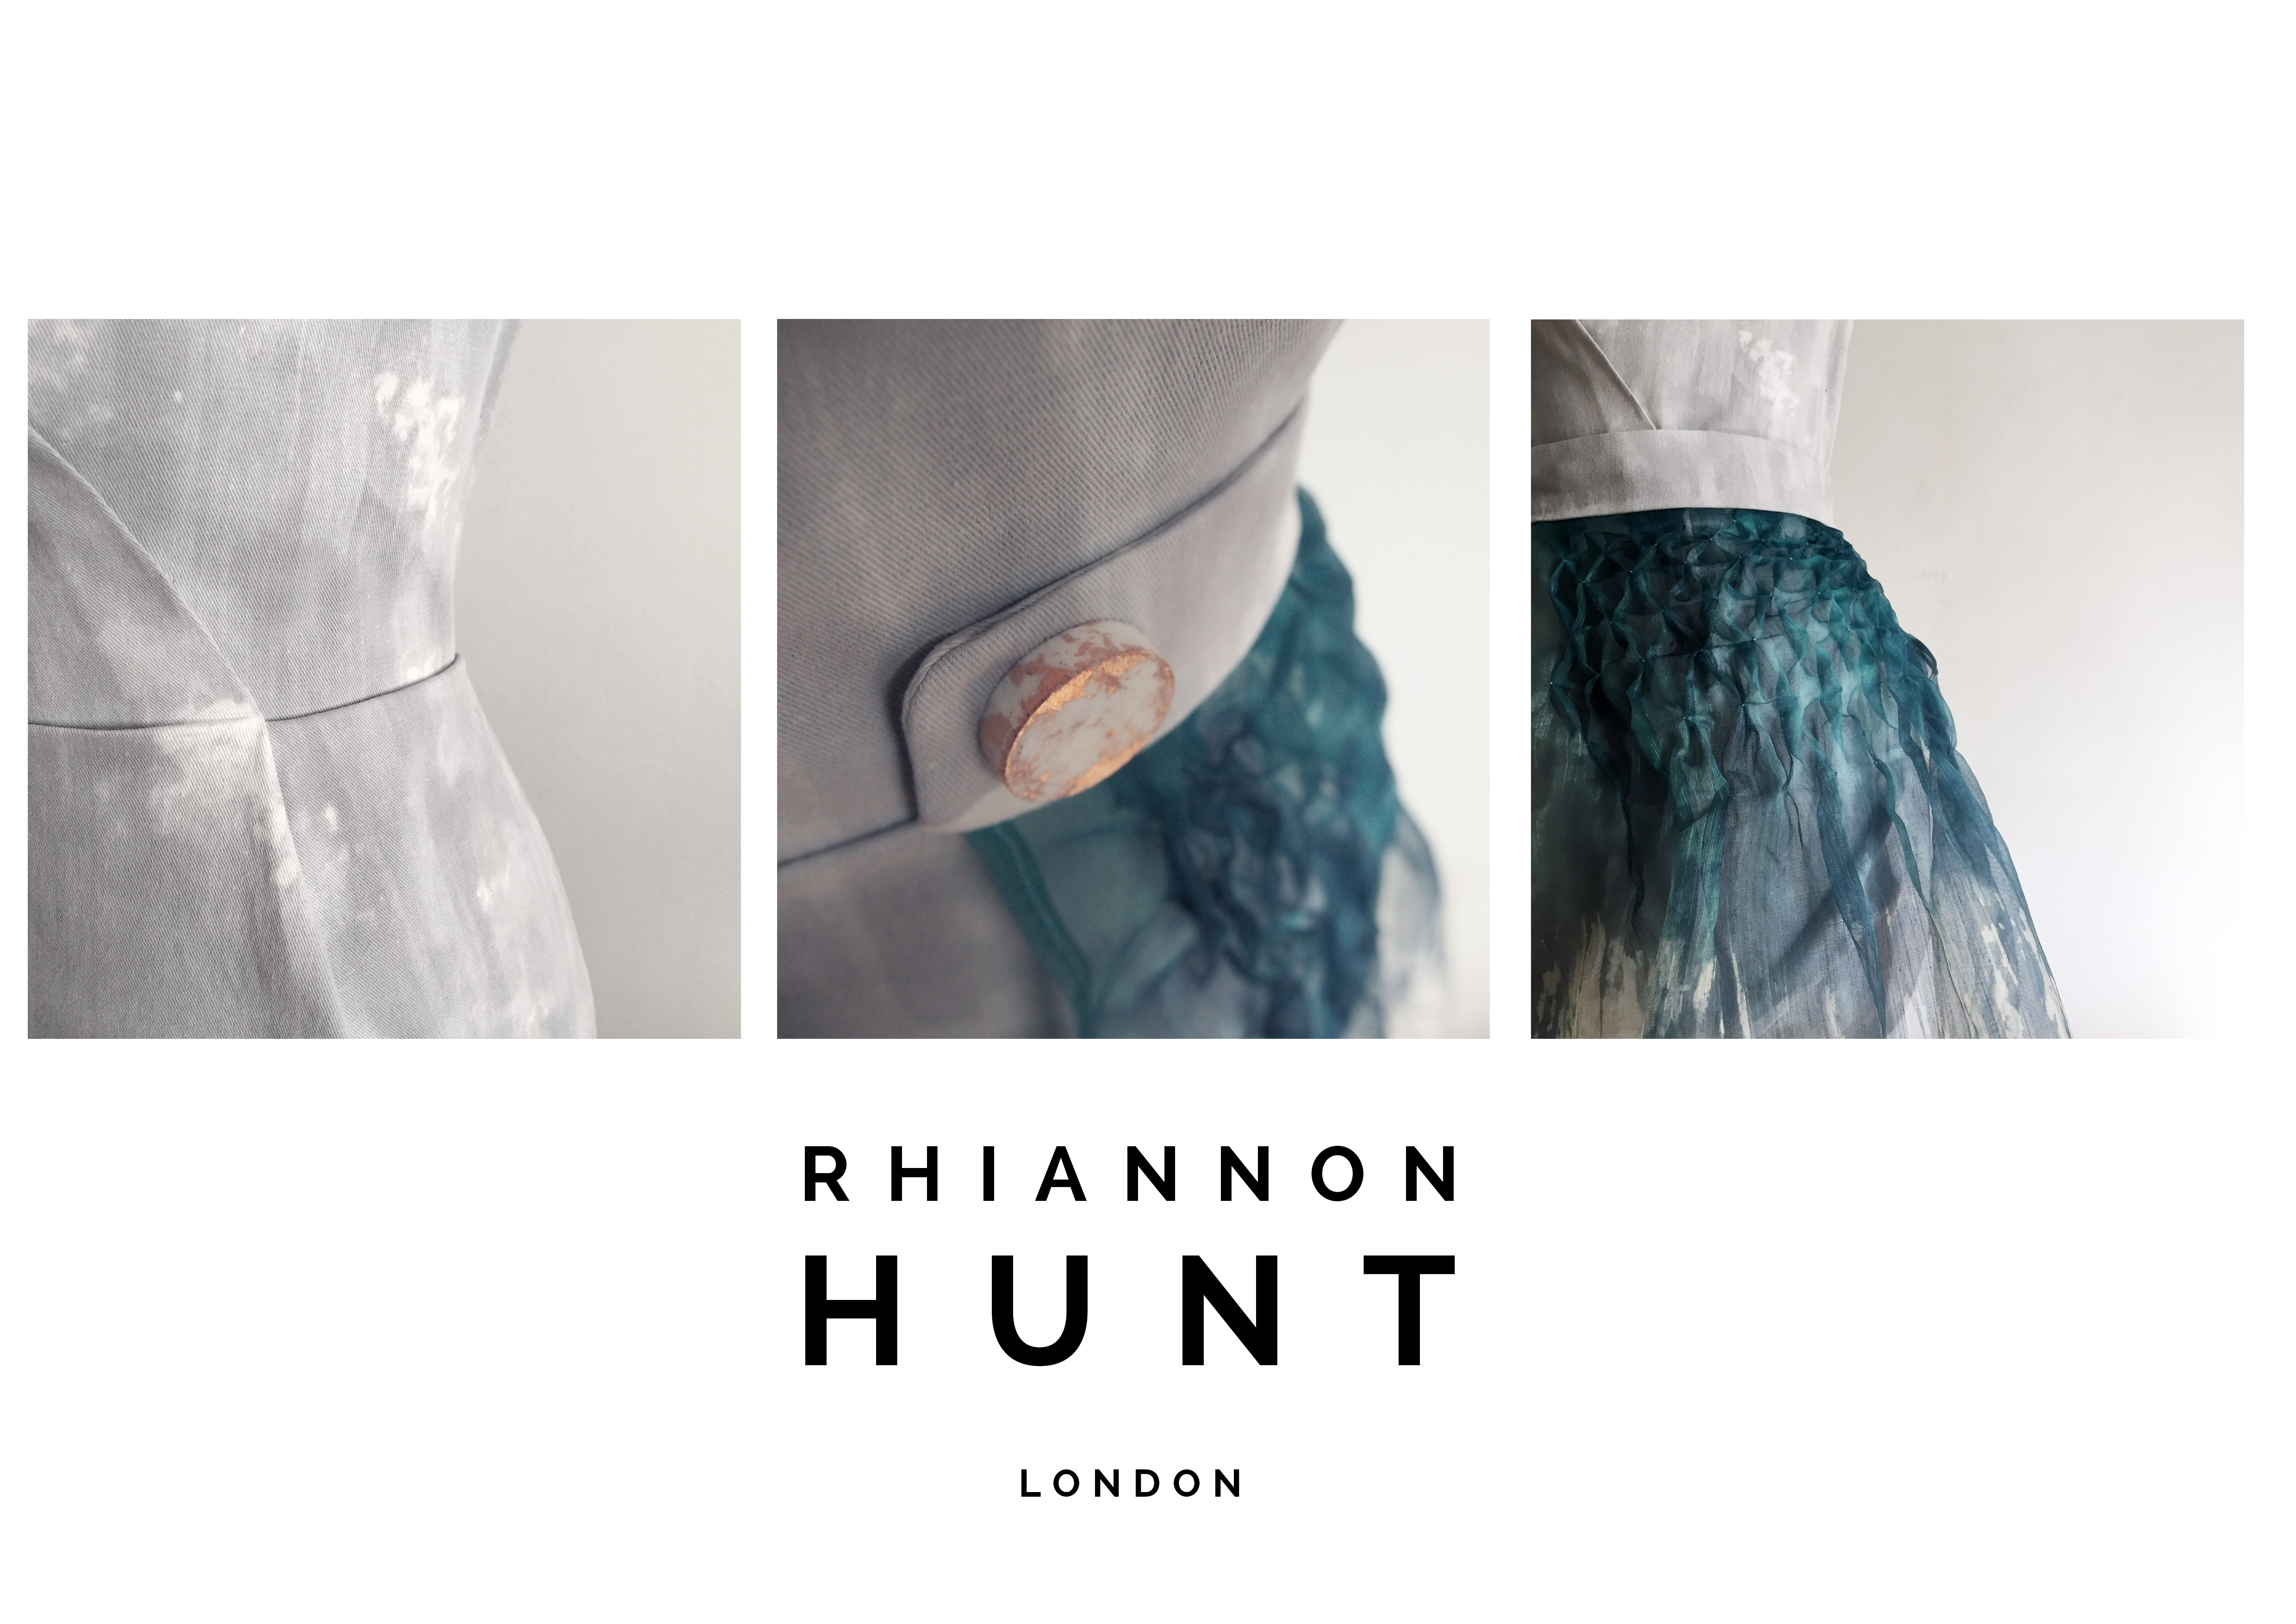 Rhiannon Hunt